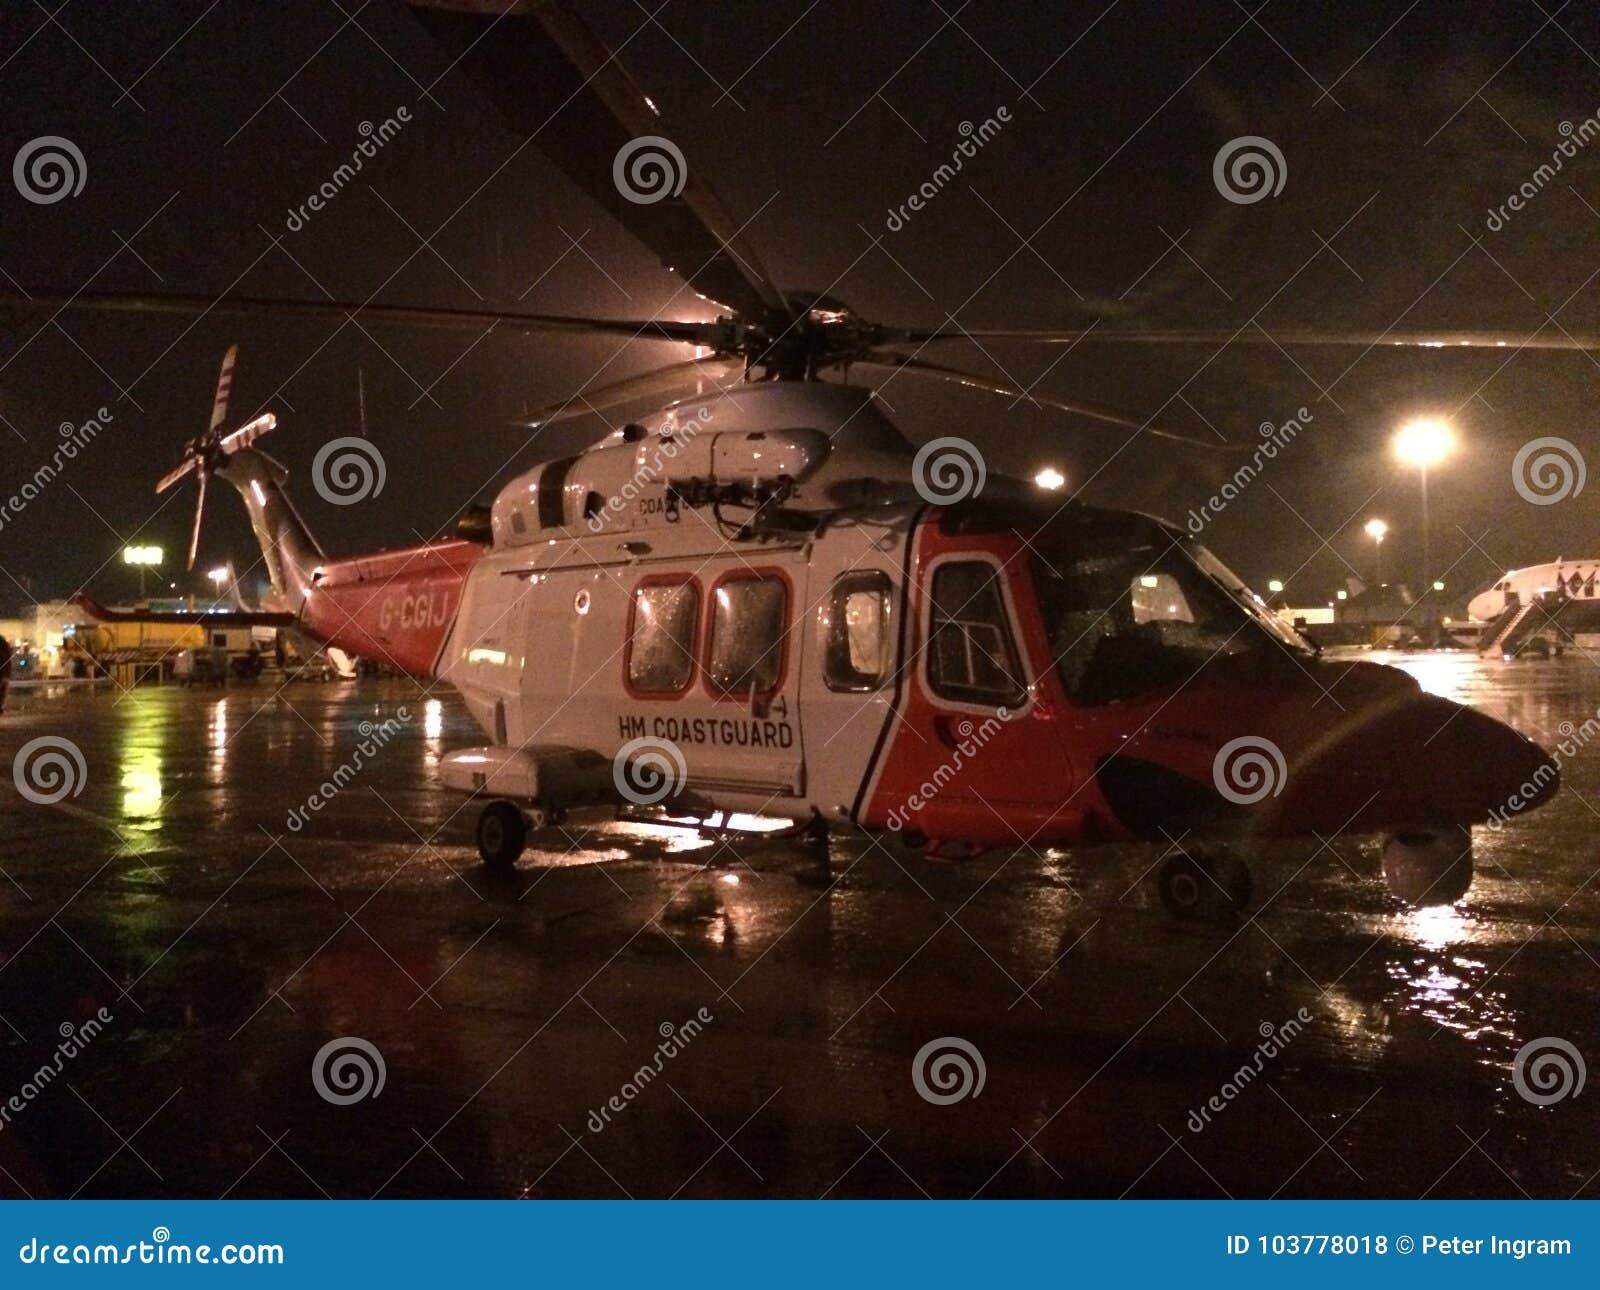 HM Coastguard Agusta Westland Helicopter - AW139